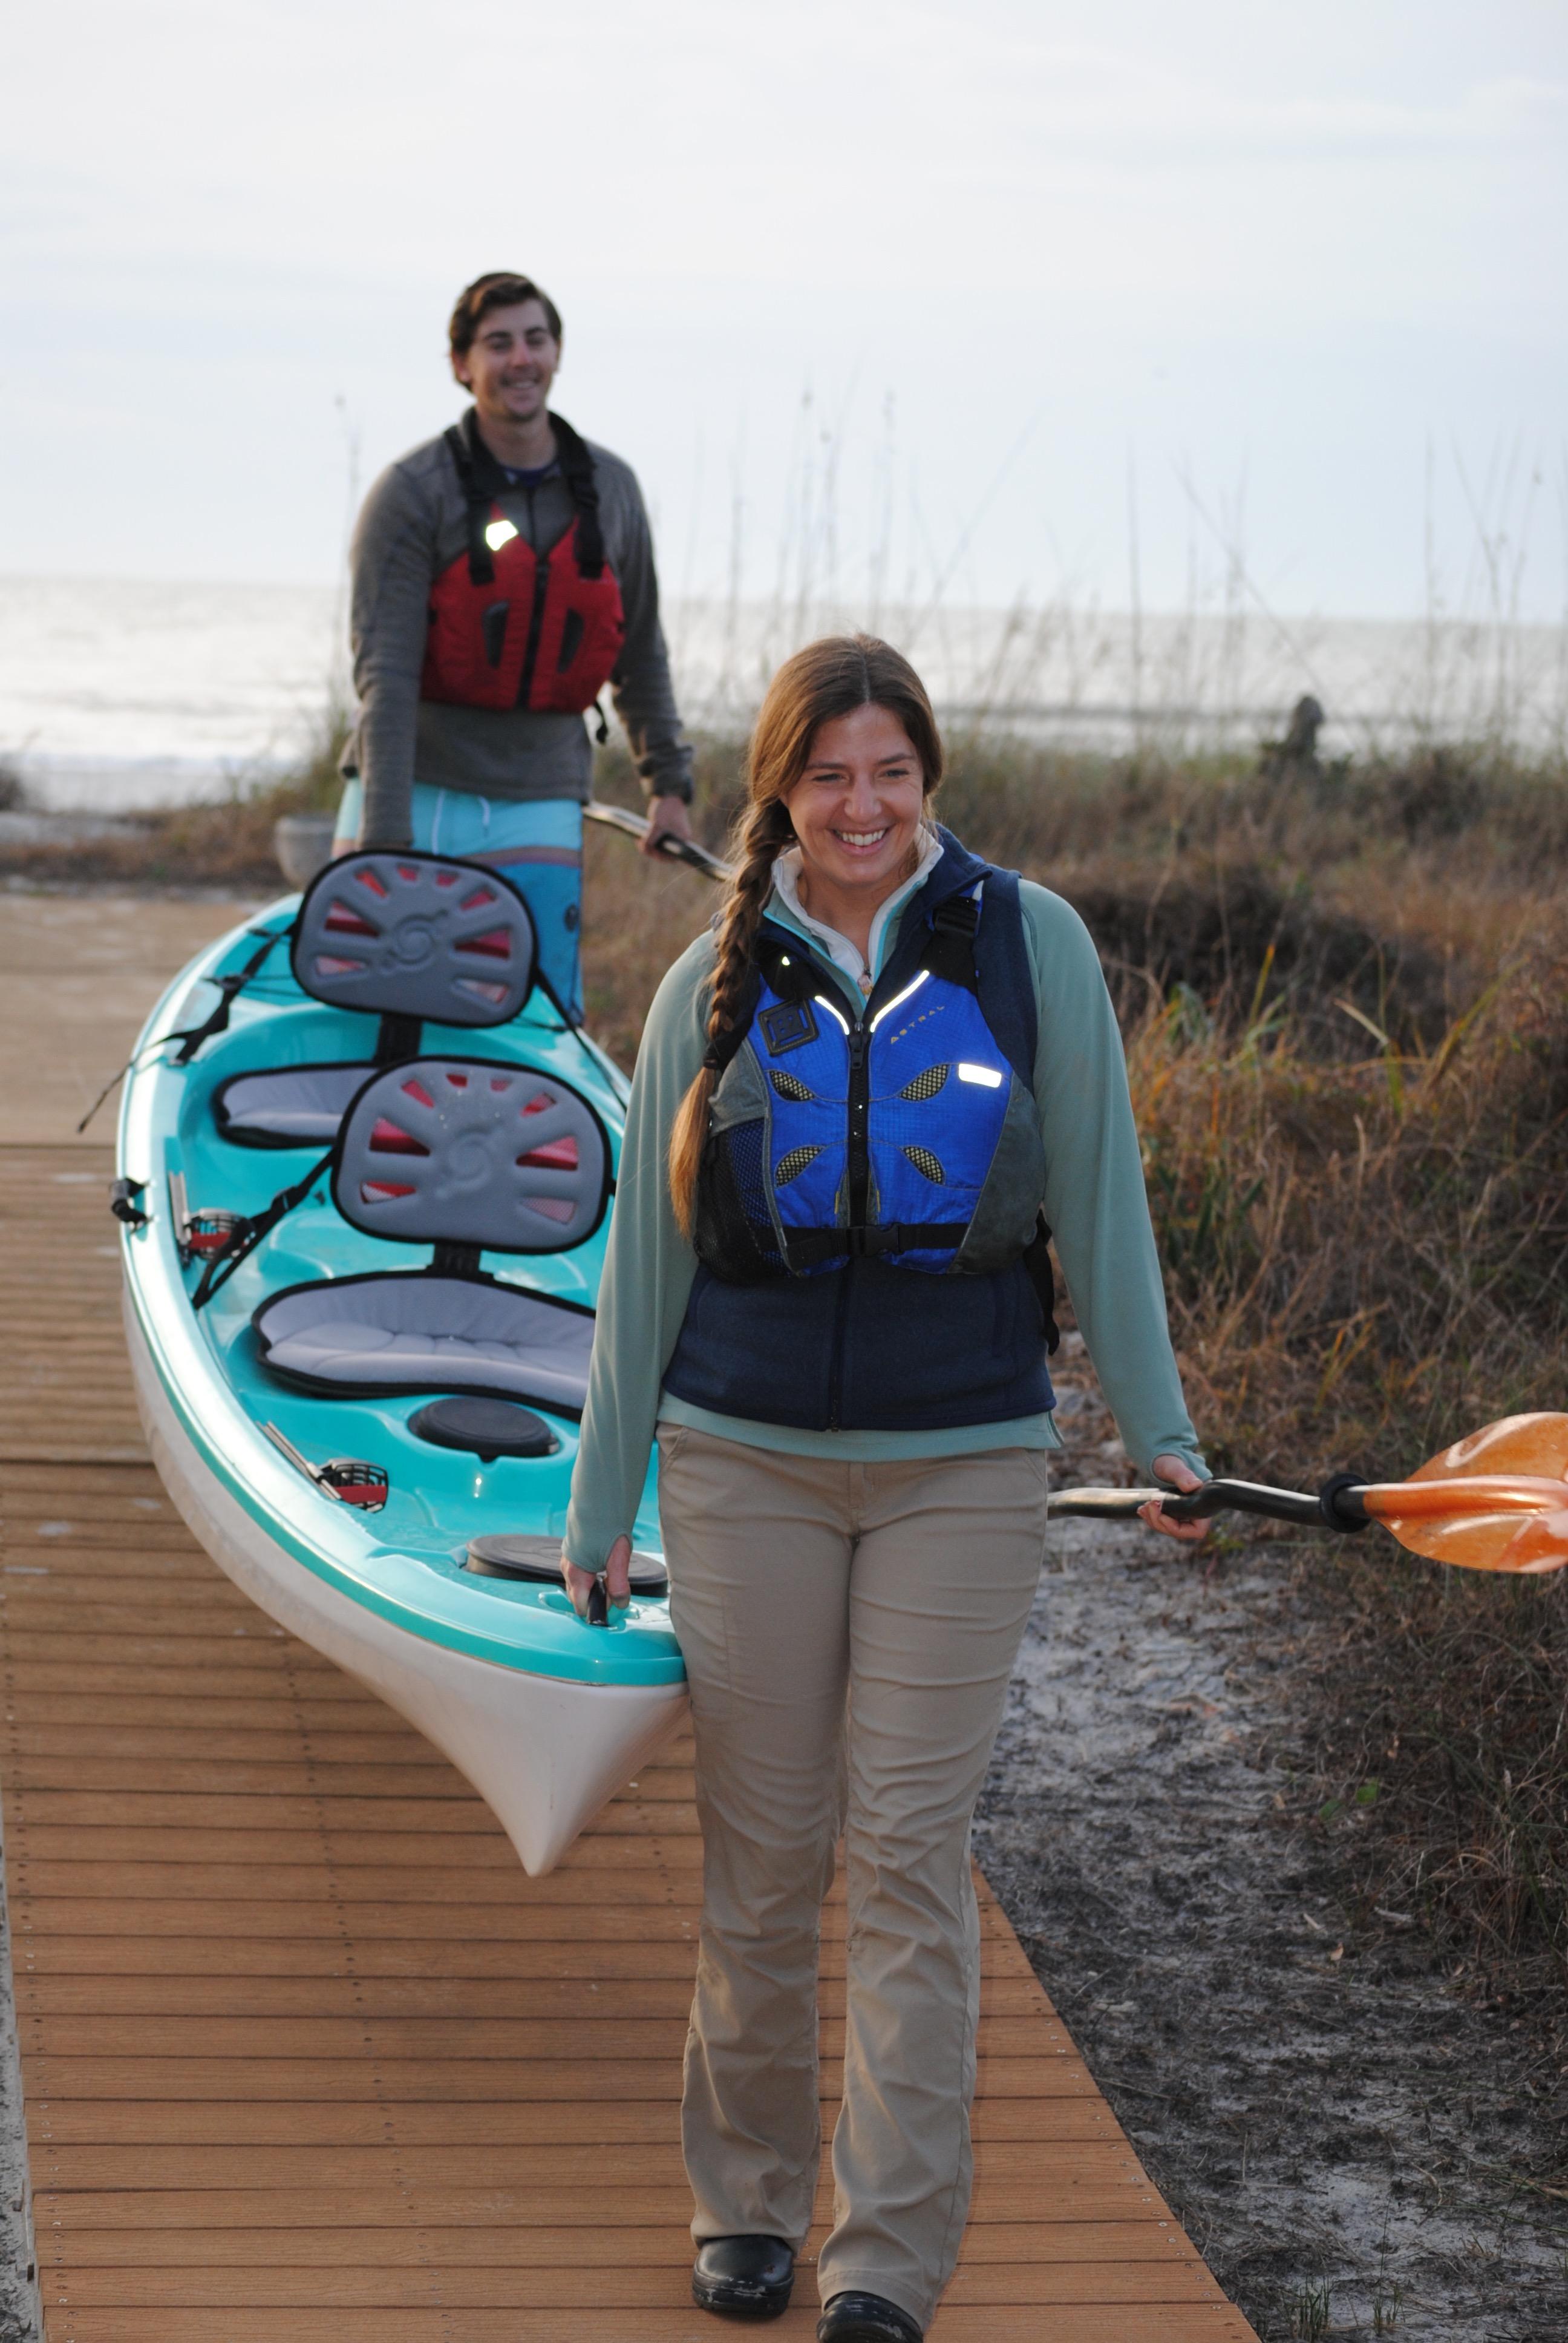 Kayaks: Skimmer 140 Tandem by Hurricane Kayaks - Image 4558